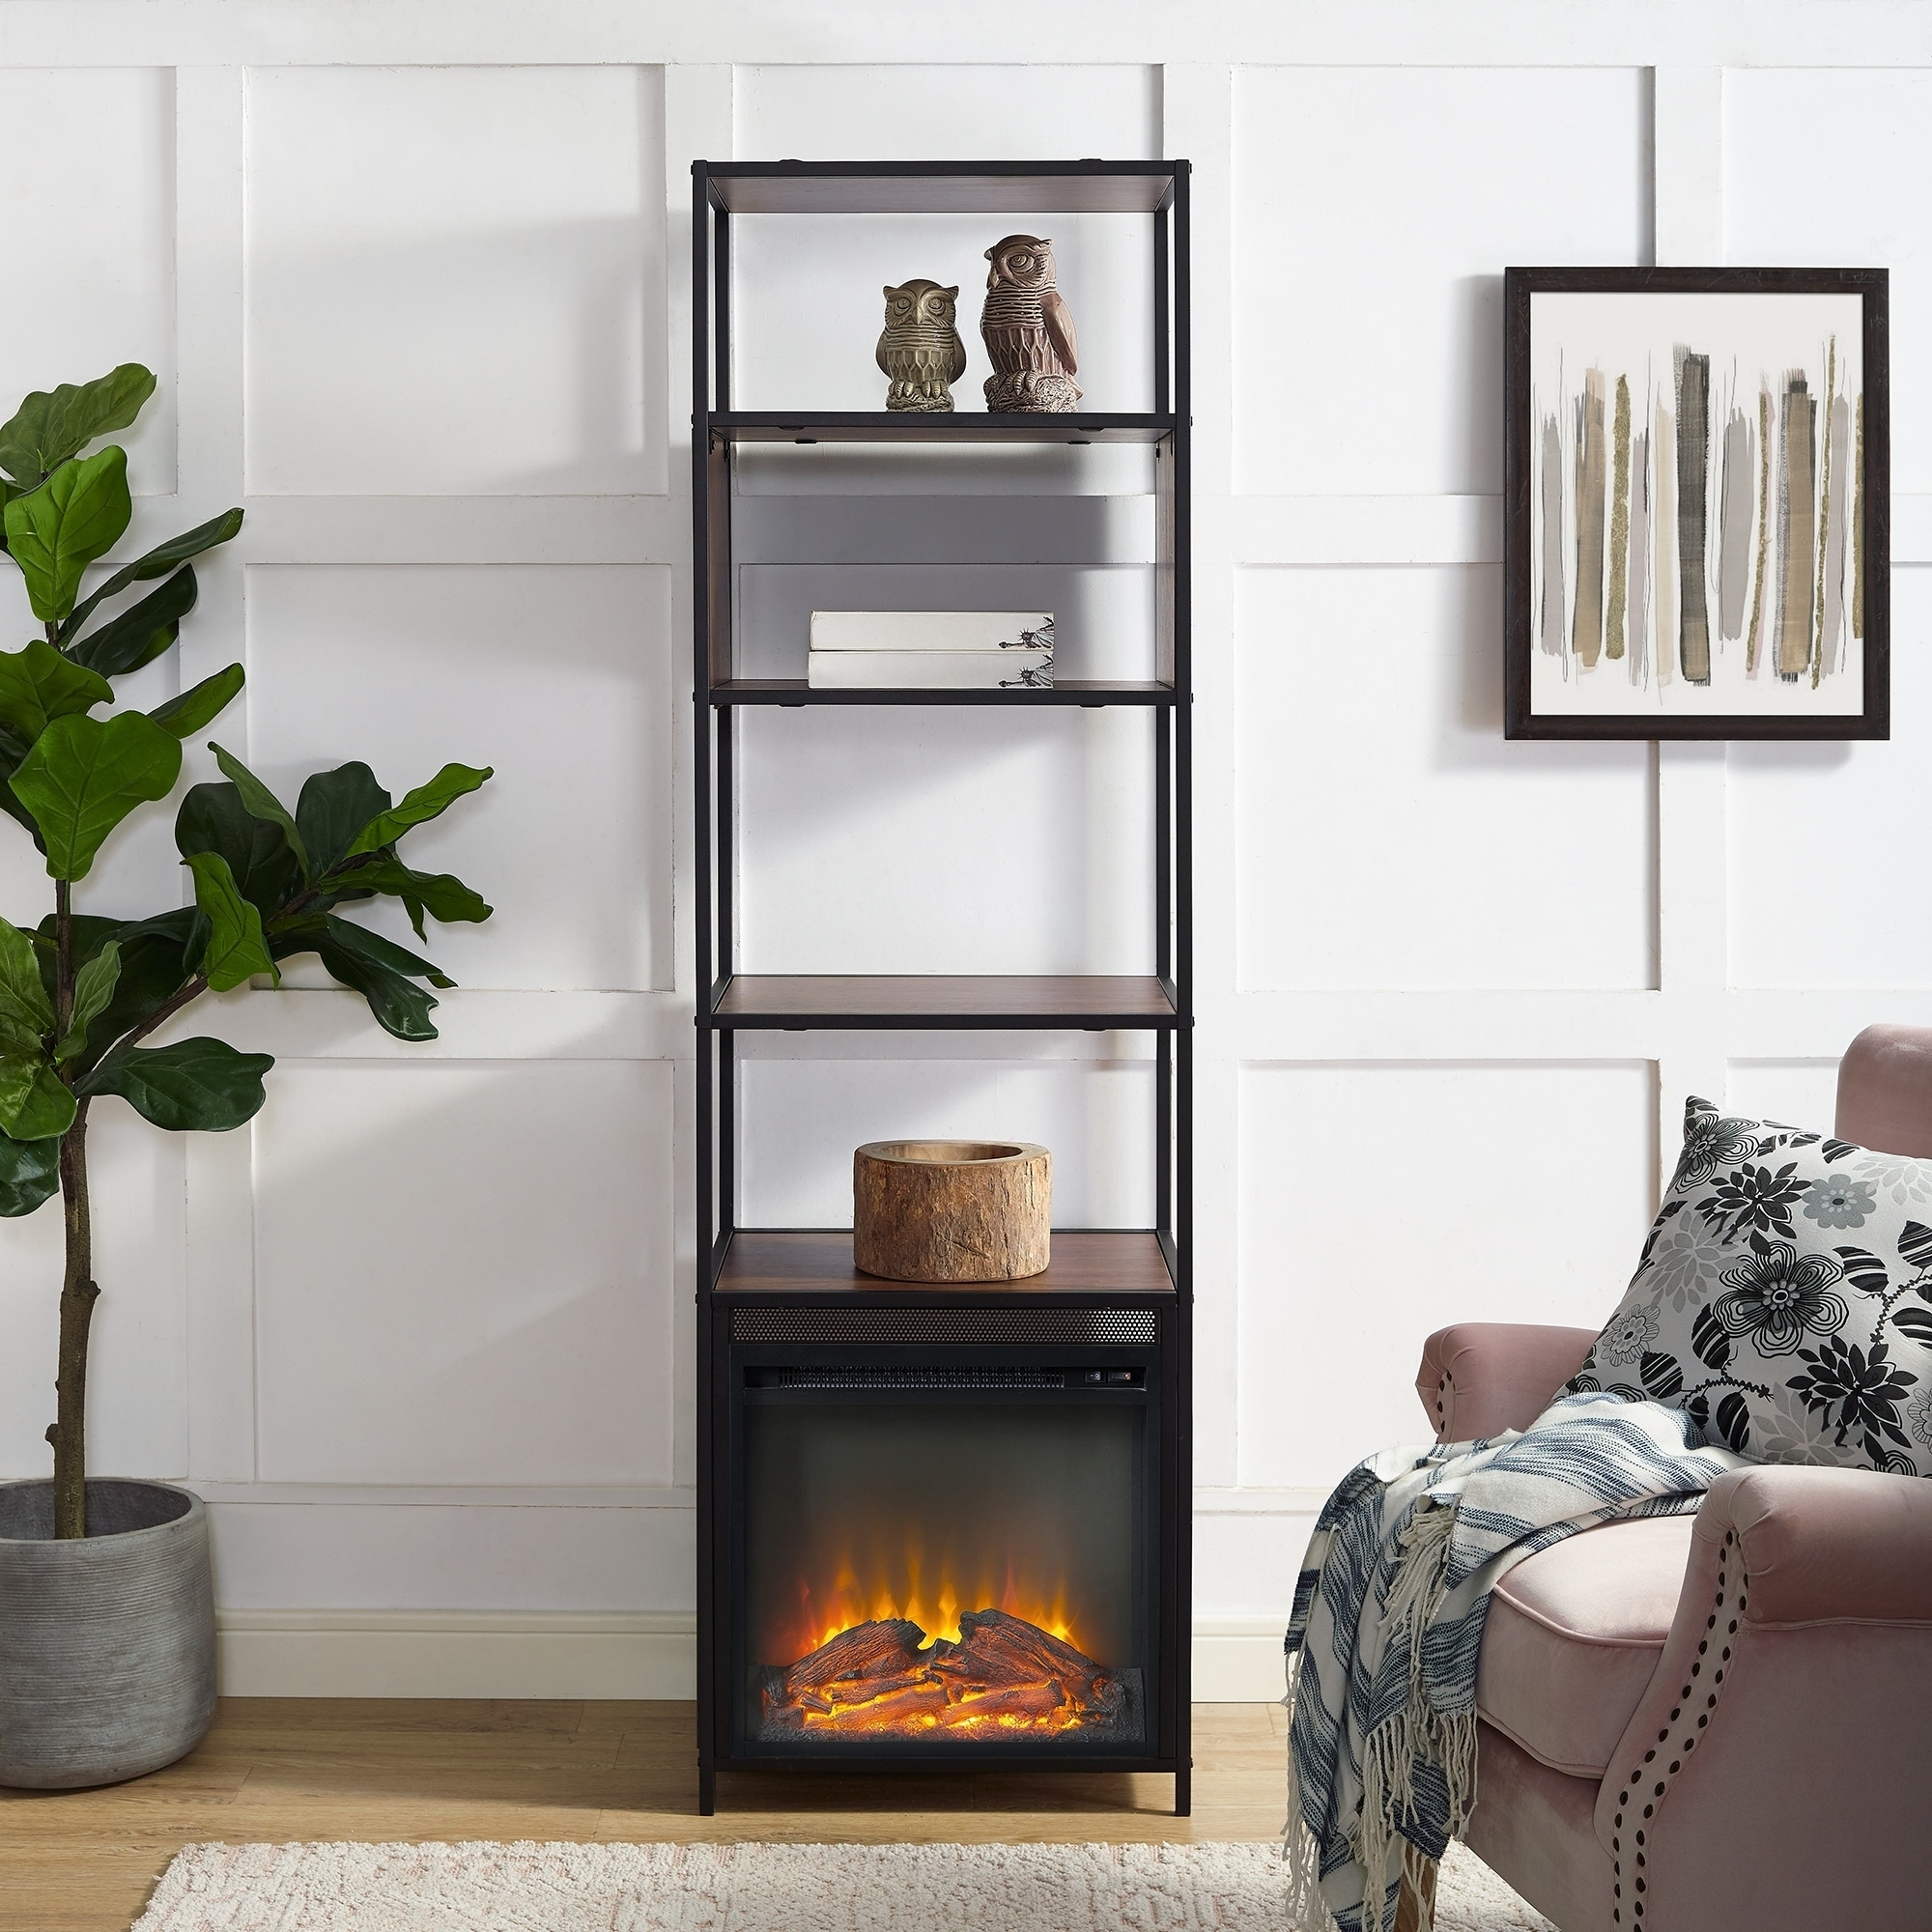 Metal And Wood Tower Bookshelf Fireplace 20 X